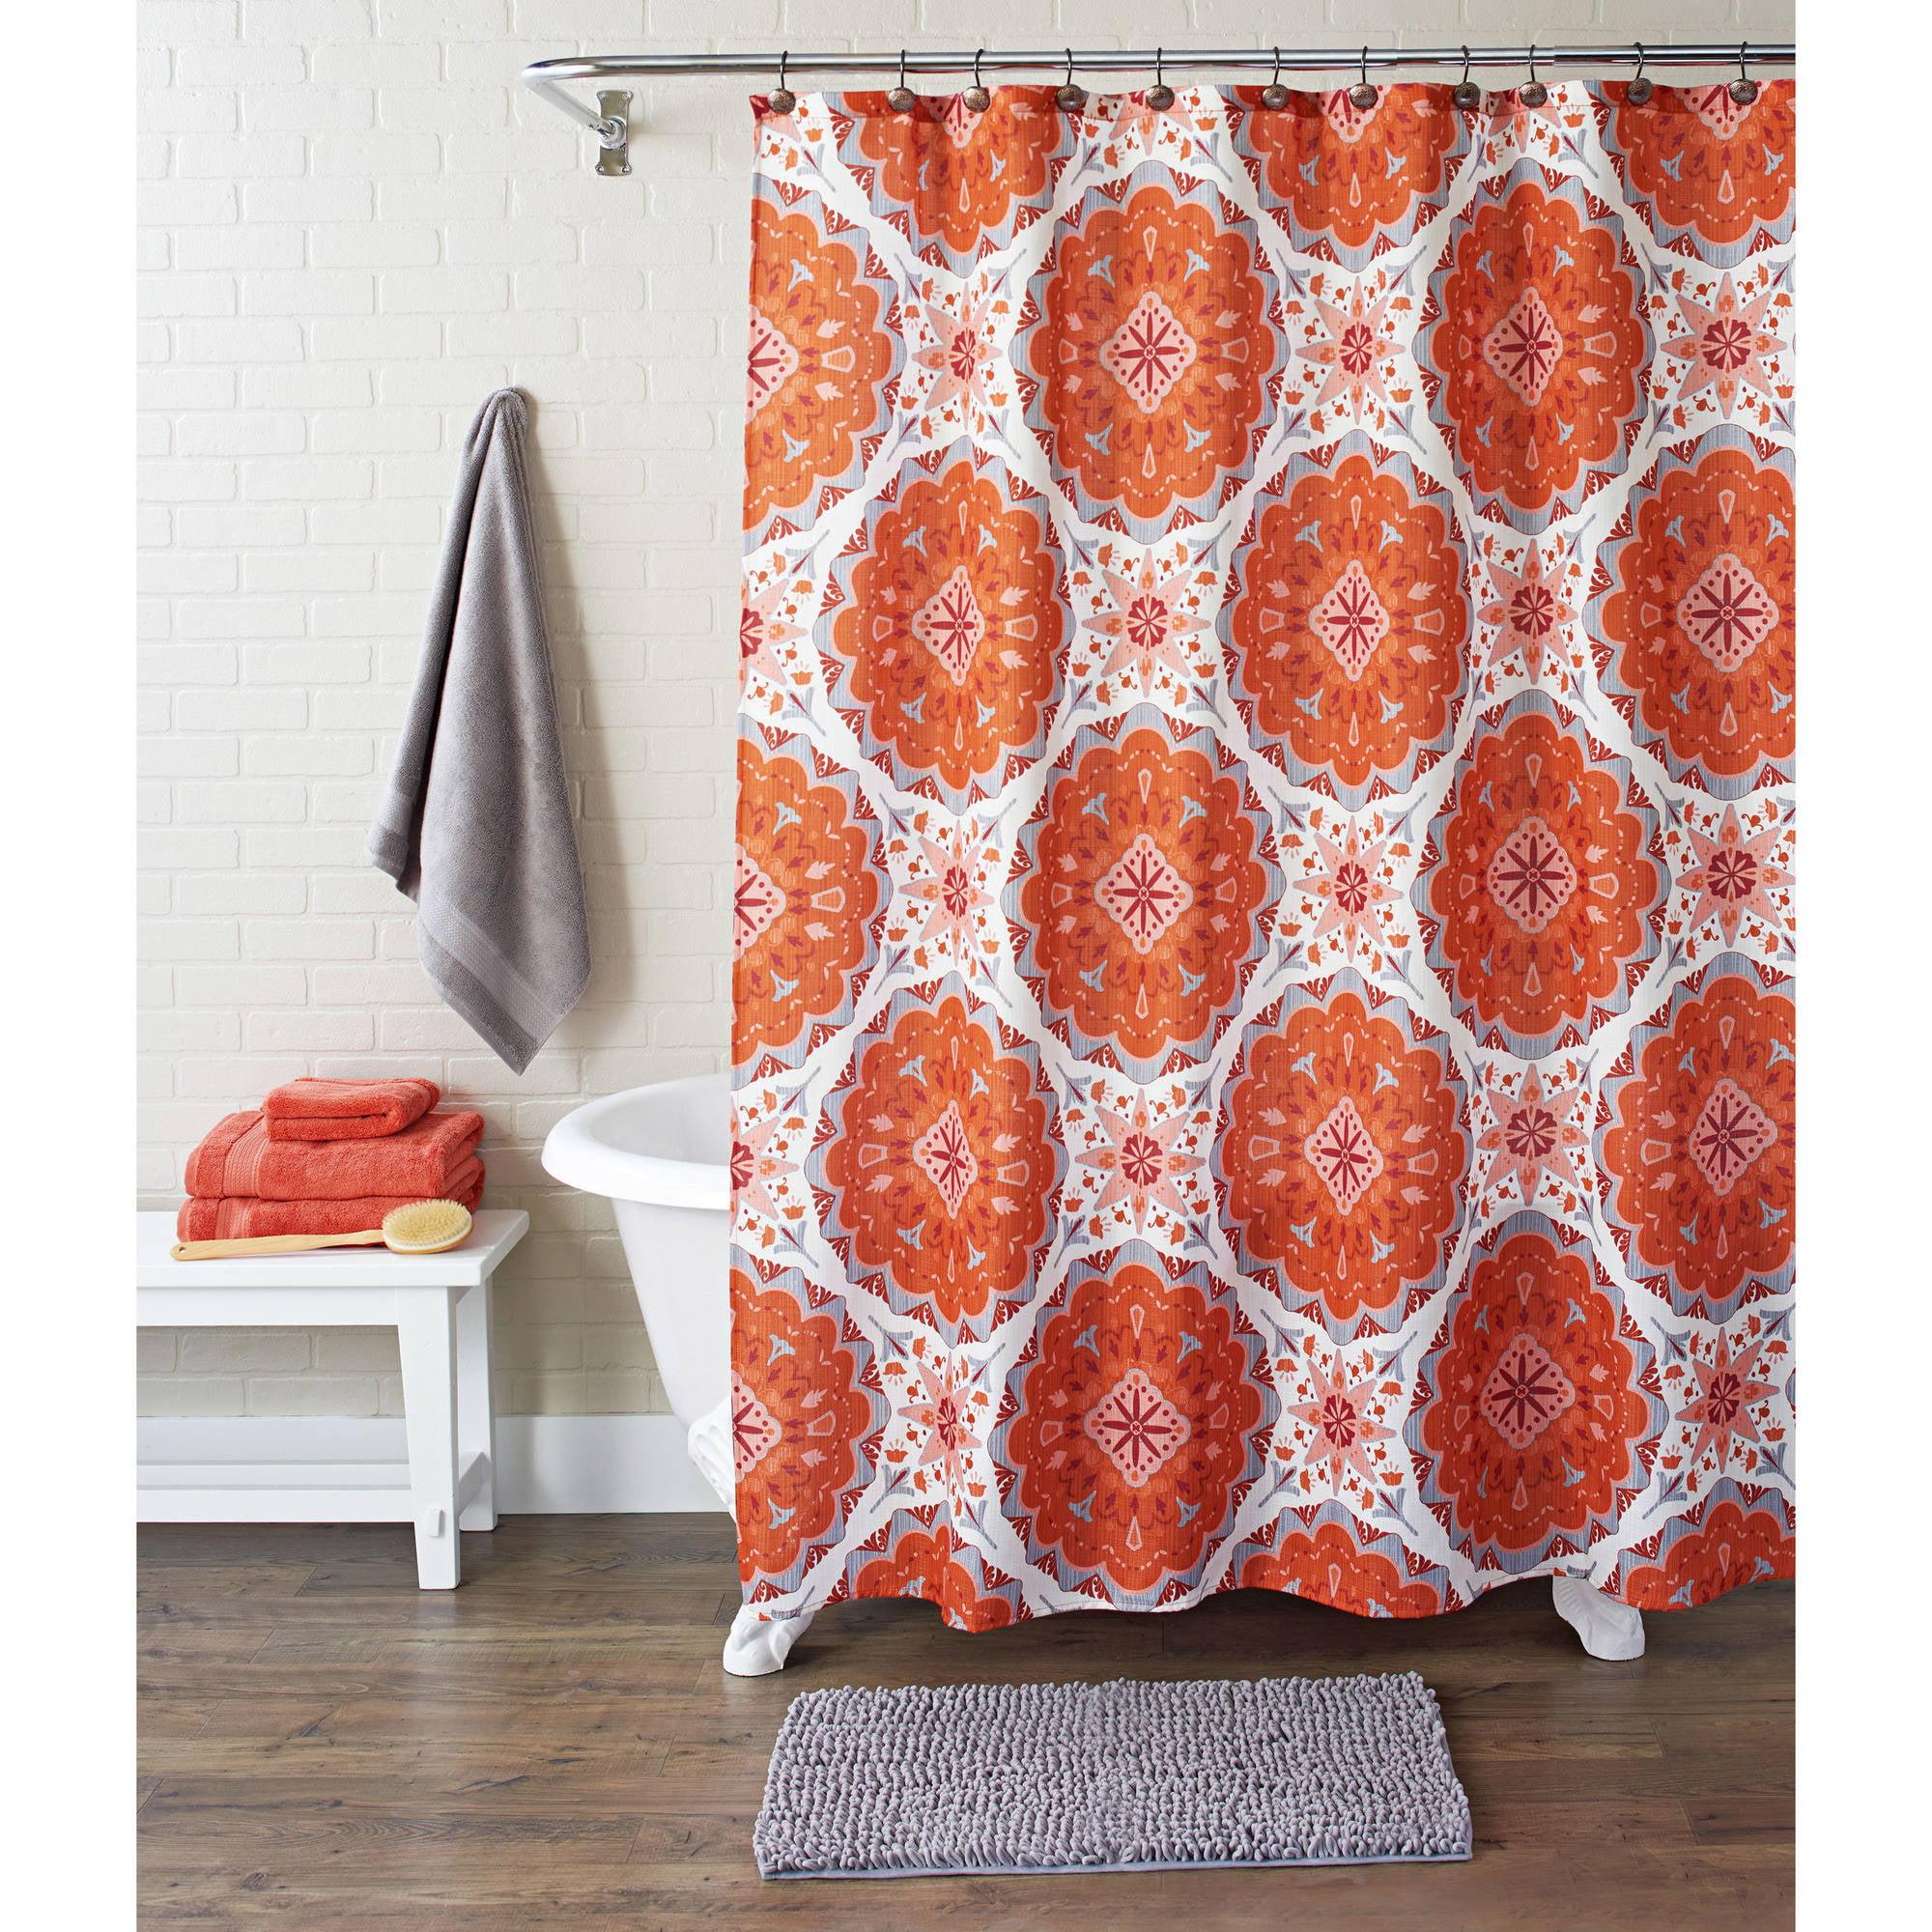 Better Homes and Gardens 13 Piece Shower Set  Nomadic Suzani. Better Homes and Gardens Shower Curtains   Walmart com